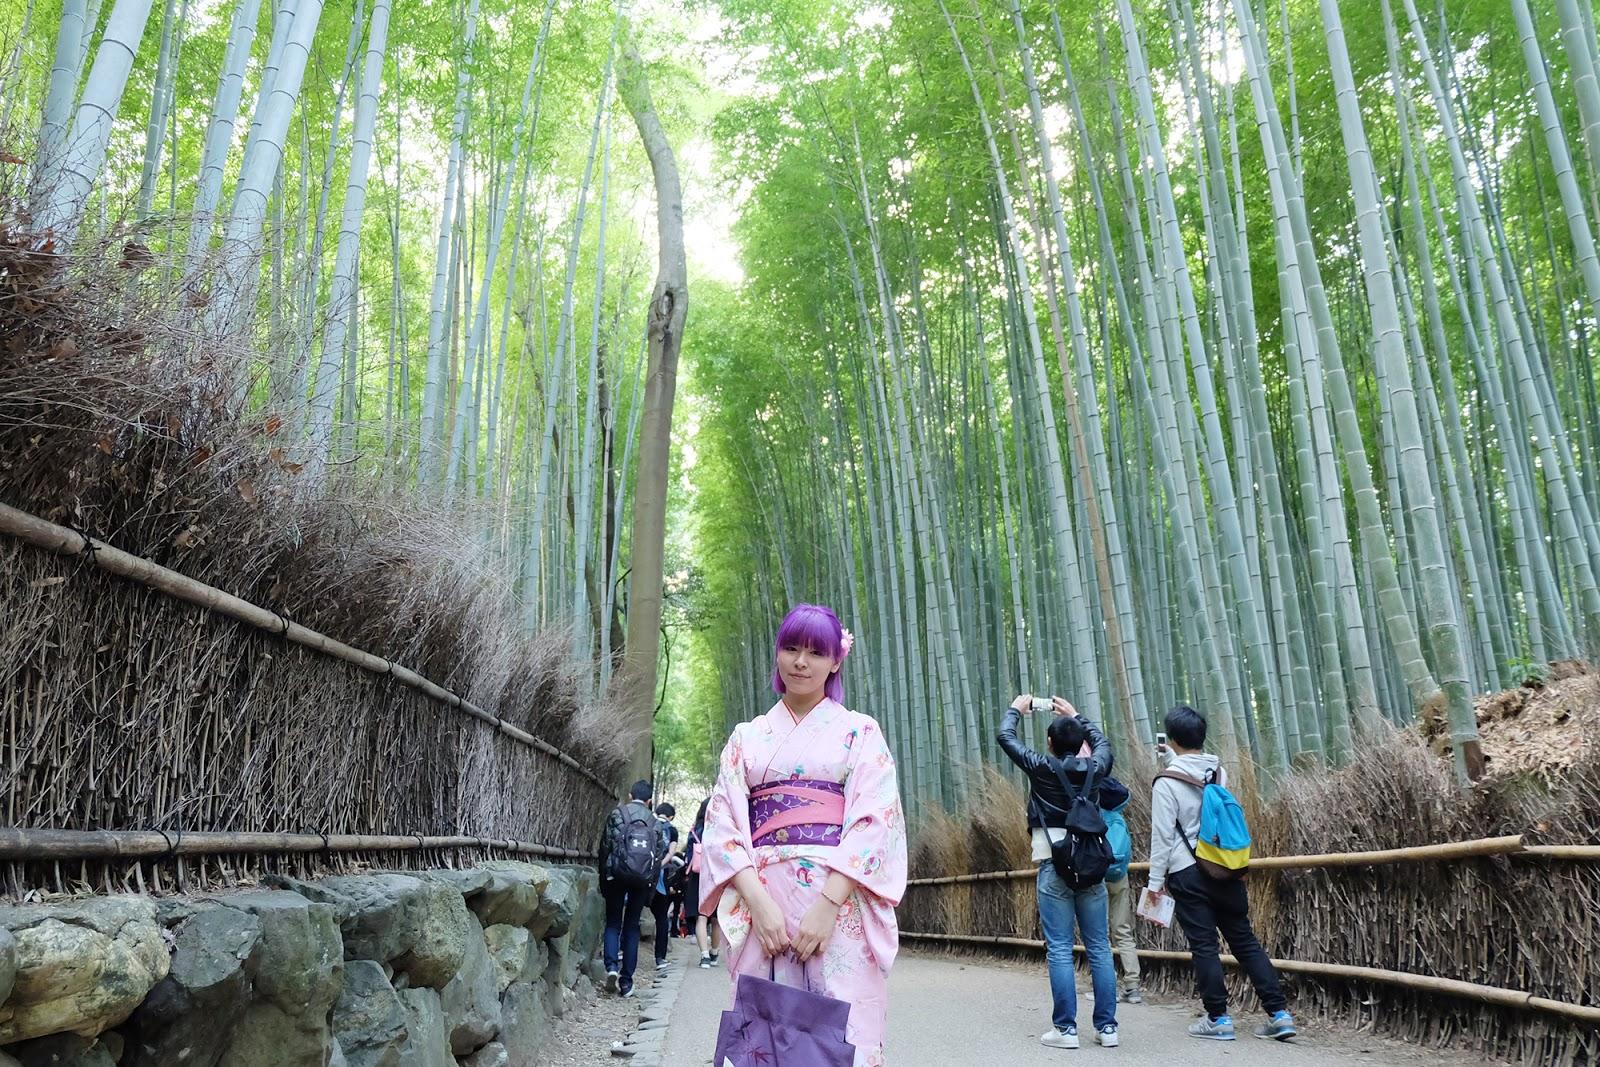 Japan 14 days itinerary kyoto arashiyama | www.bigdreamerblog.com